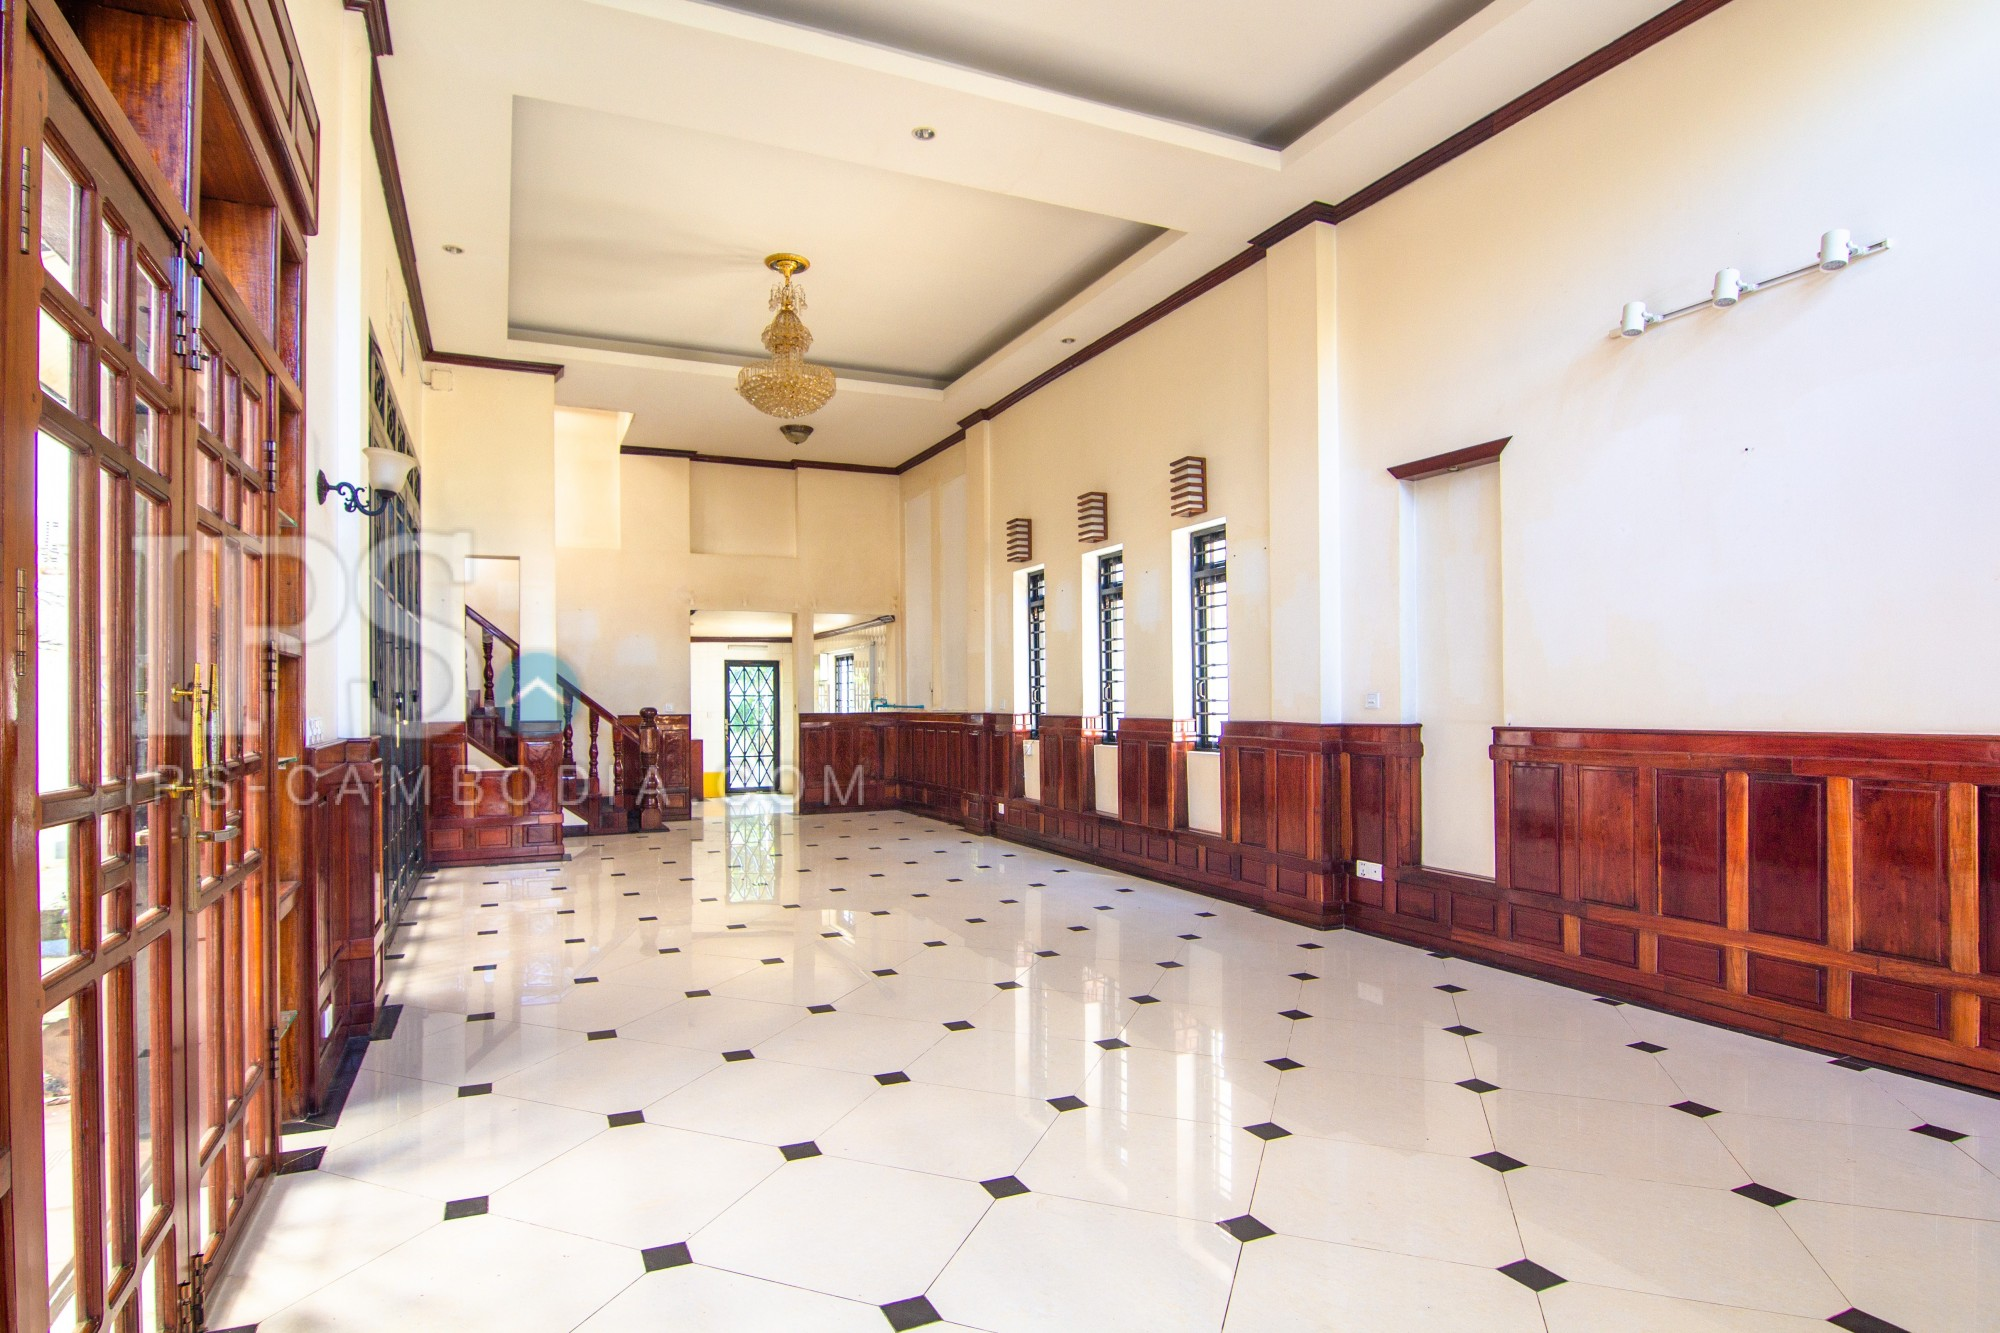 3 Bedroom House For Rent - Wat Bo, Siem Reap